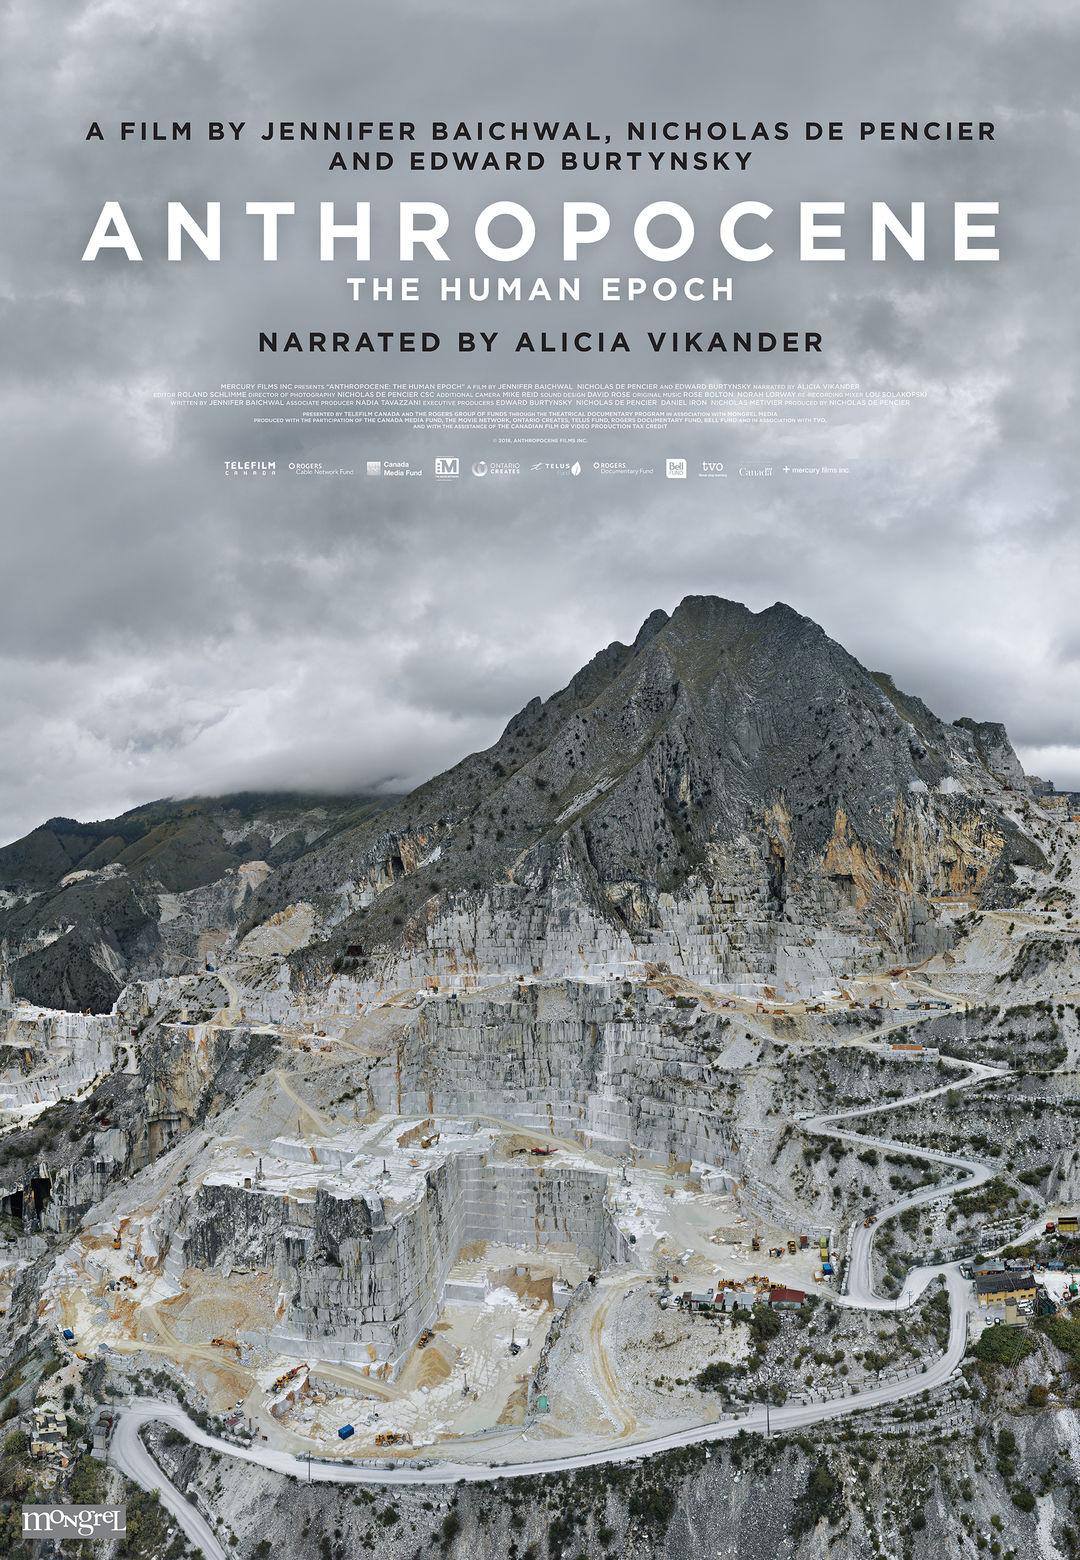 Антропоцен: Эпоха людей Anthropocene: The Human Epoch